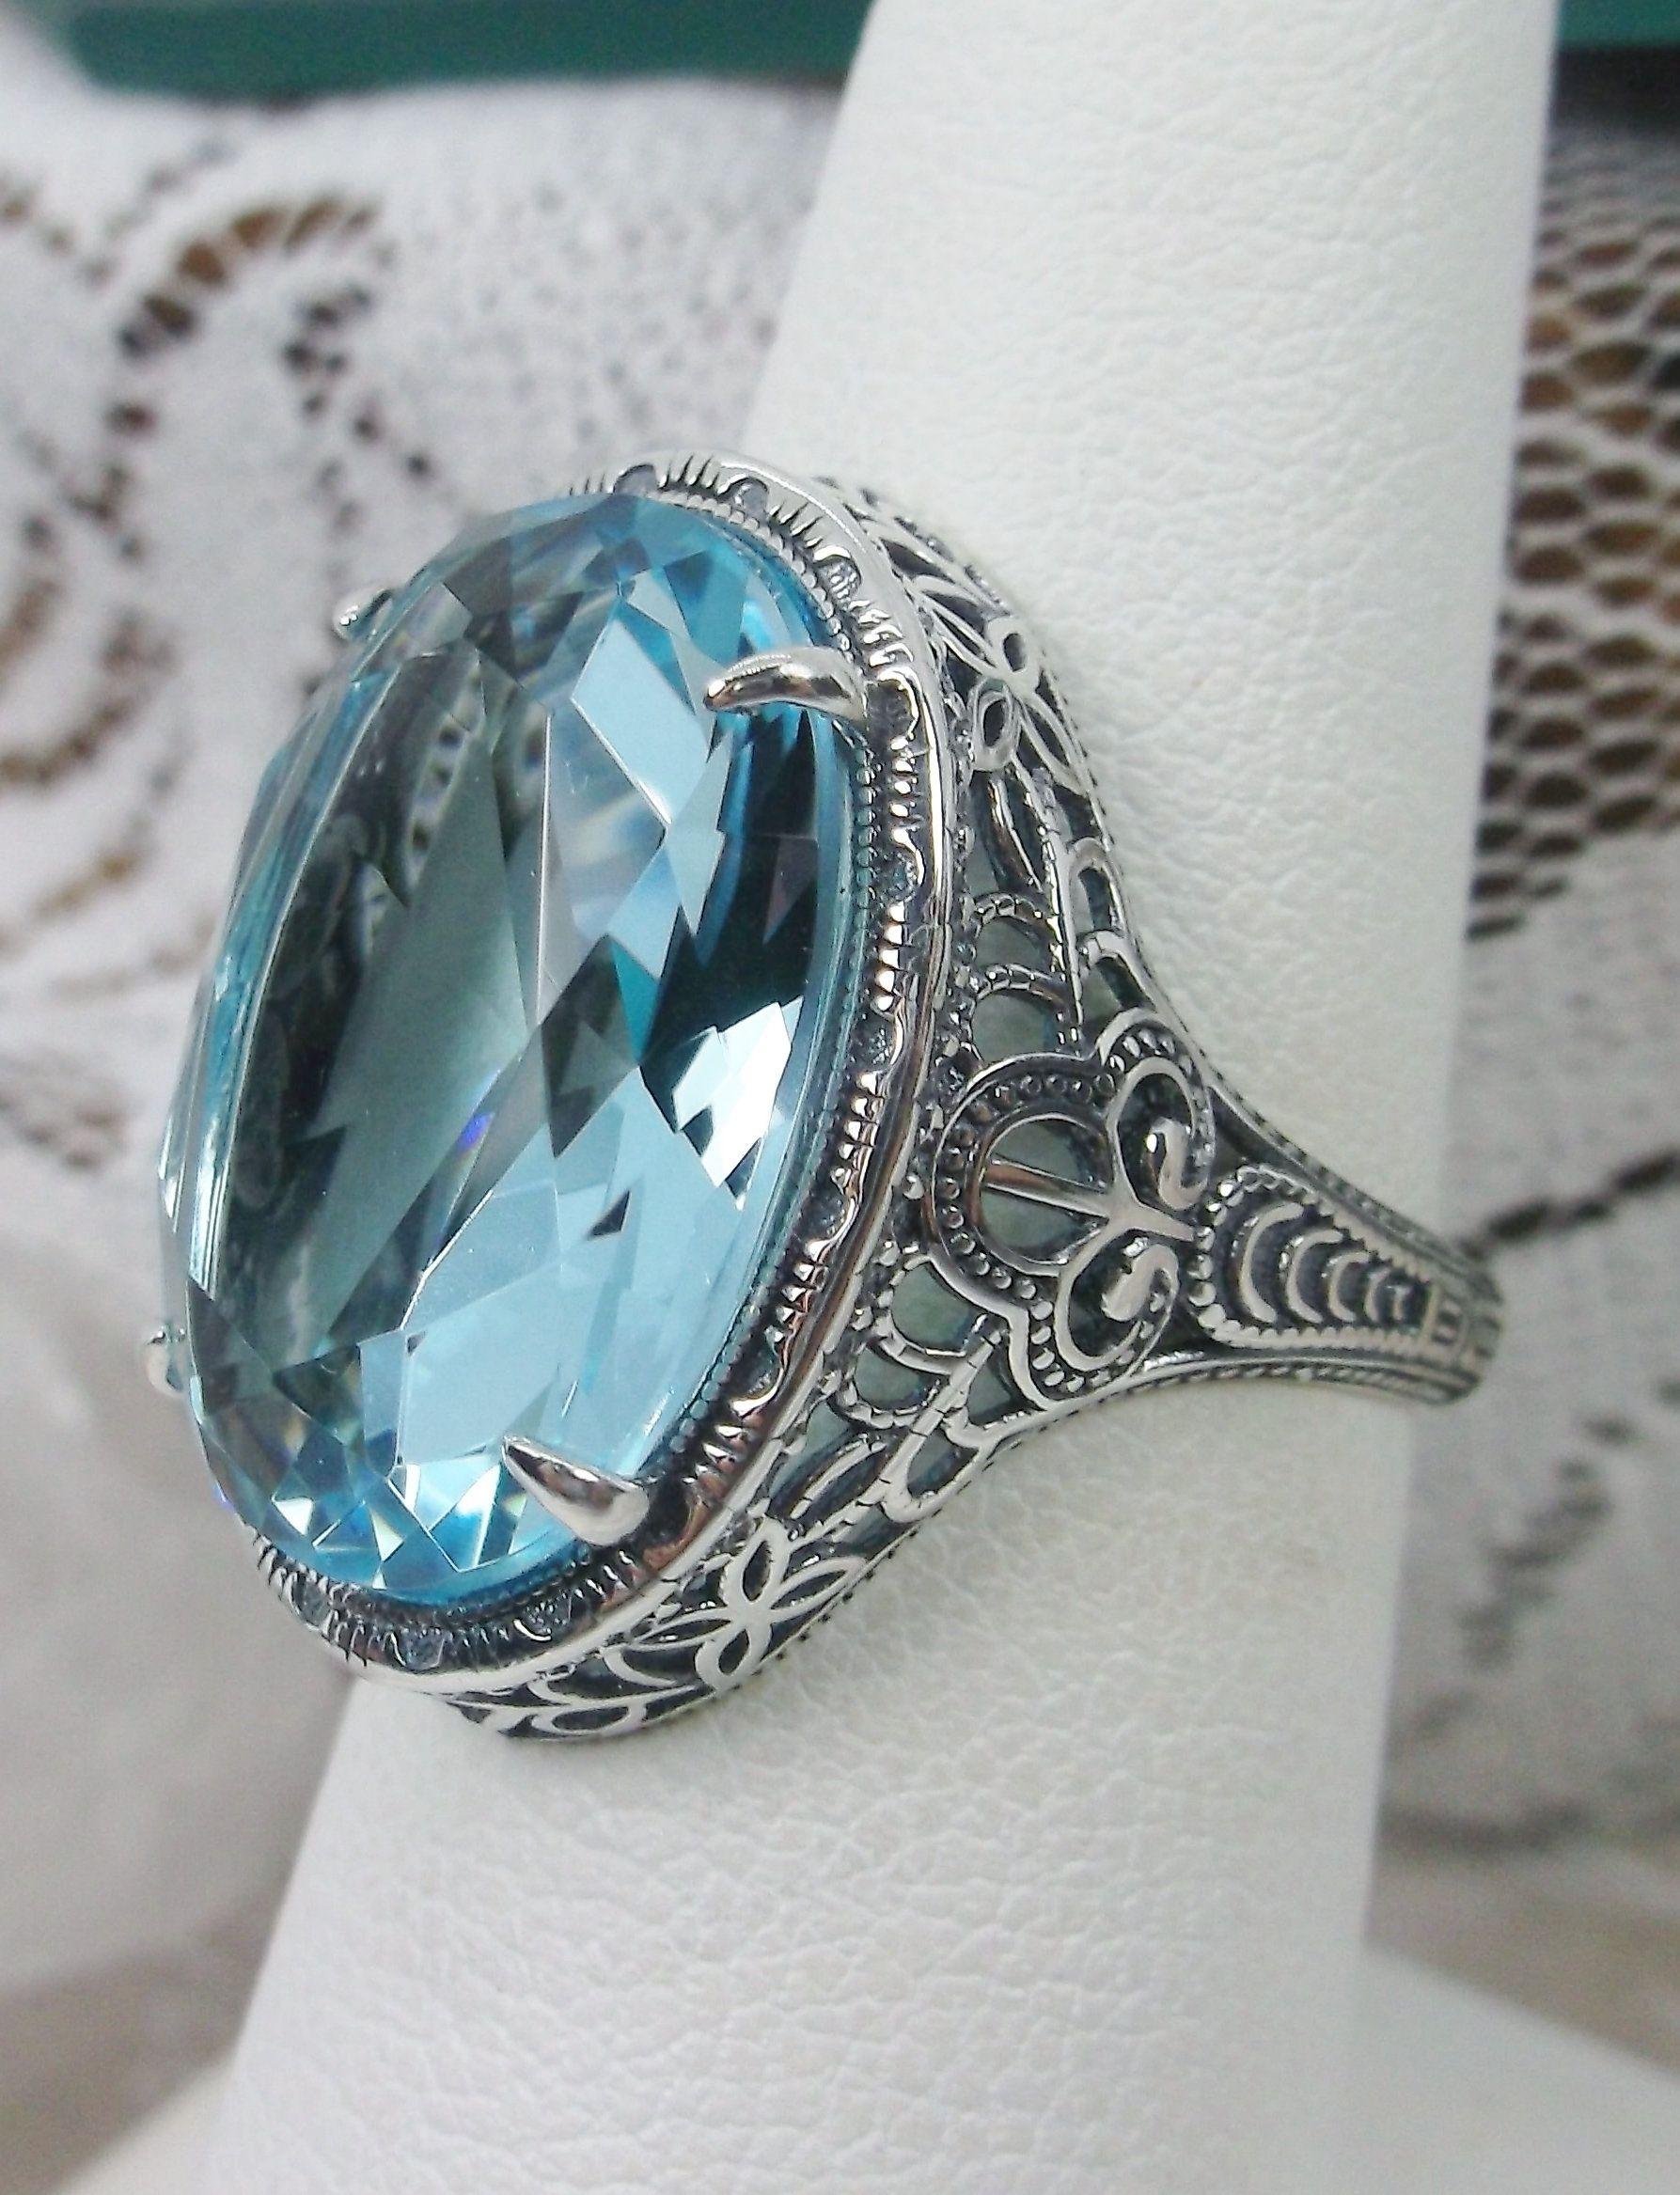 3ct Simulated Aquamarine-Blue Gemstone Solid Sterling Silver WeddingVictorianEdwardian Design Motif Filigree Ring Size 7